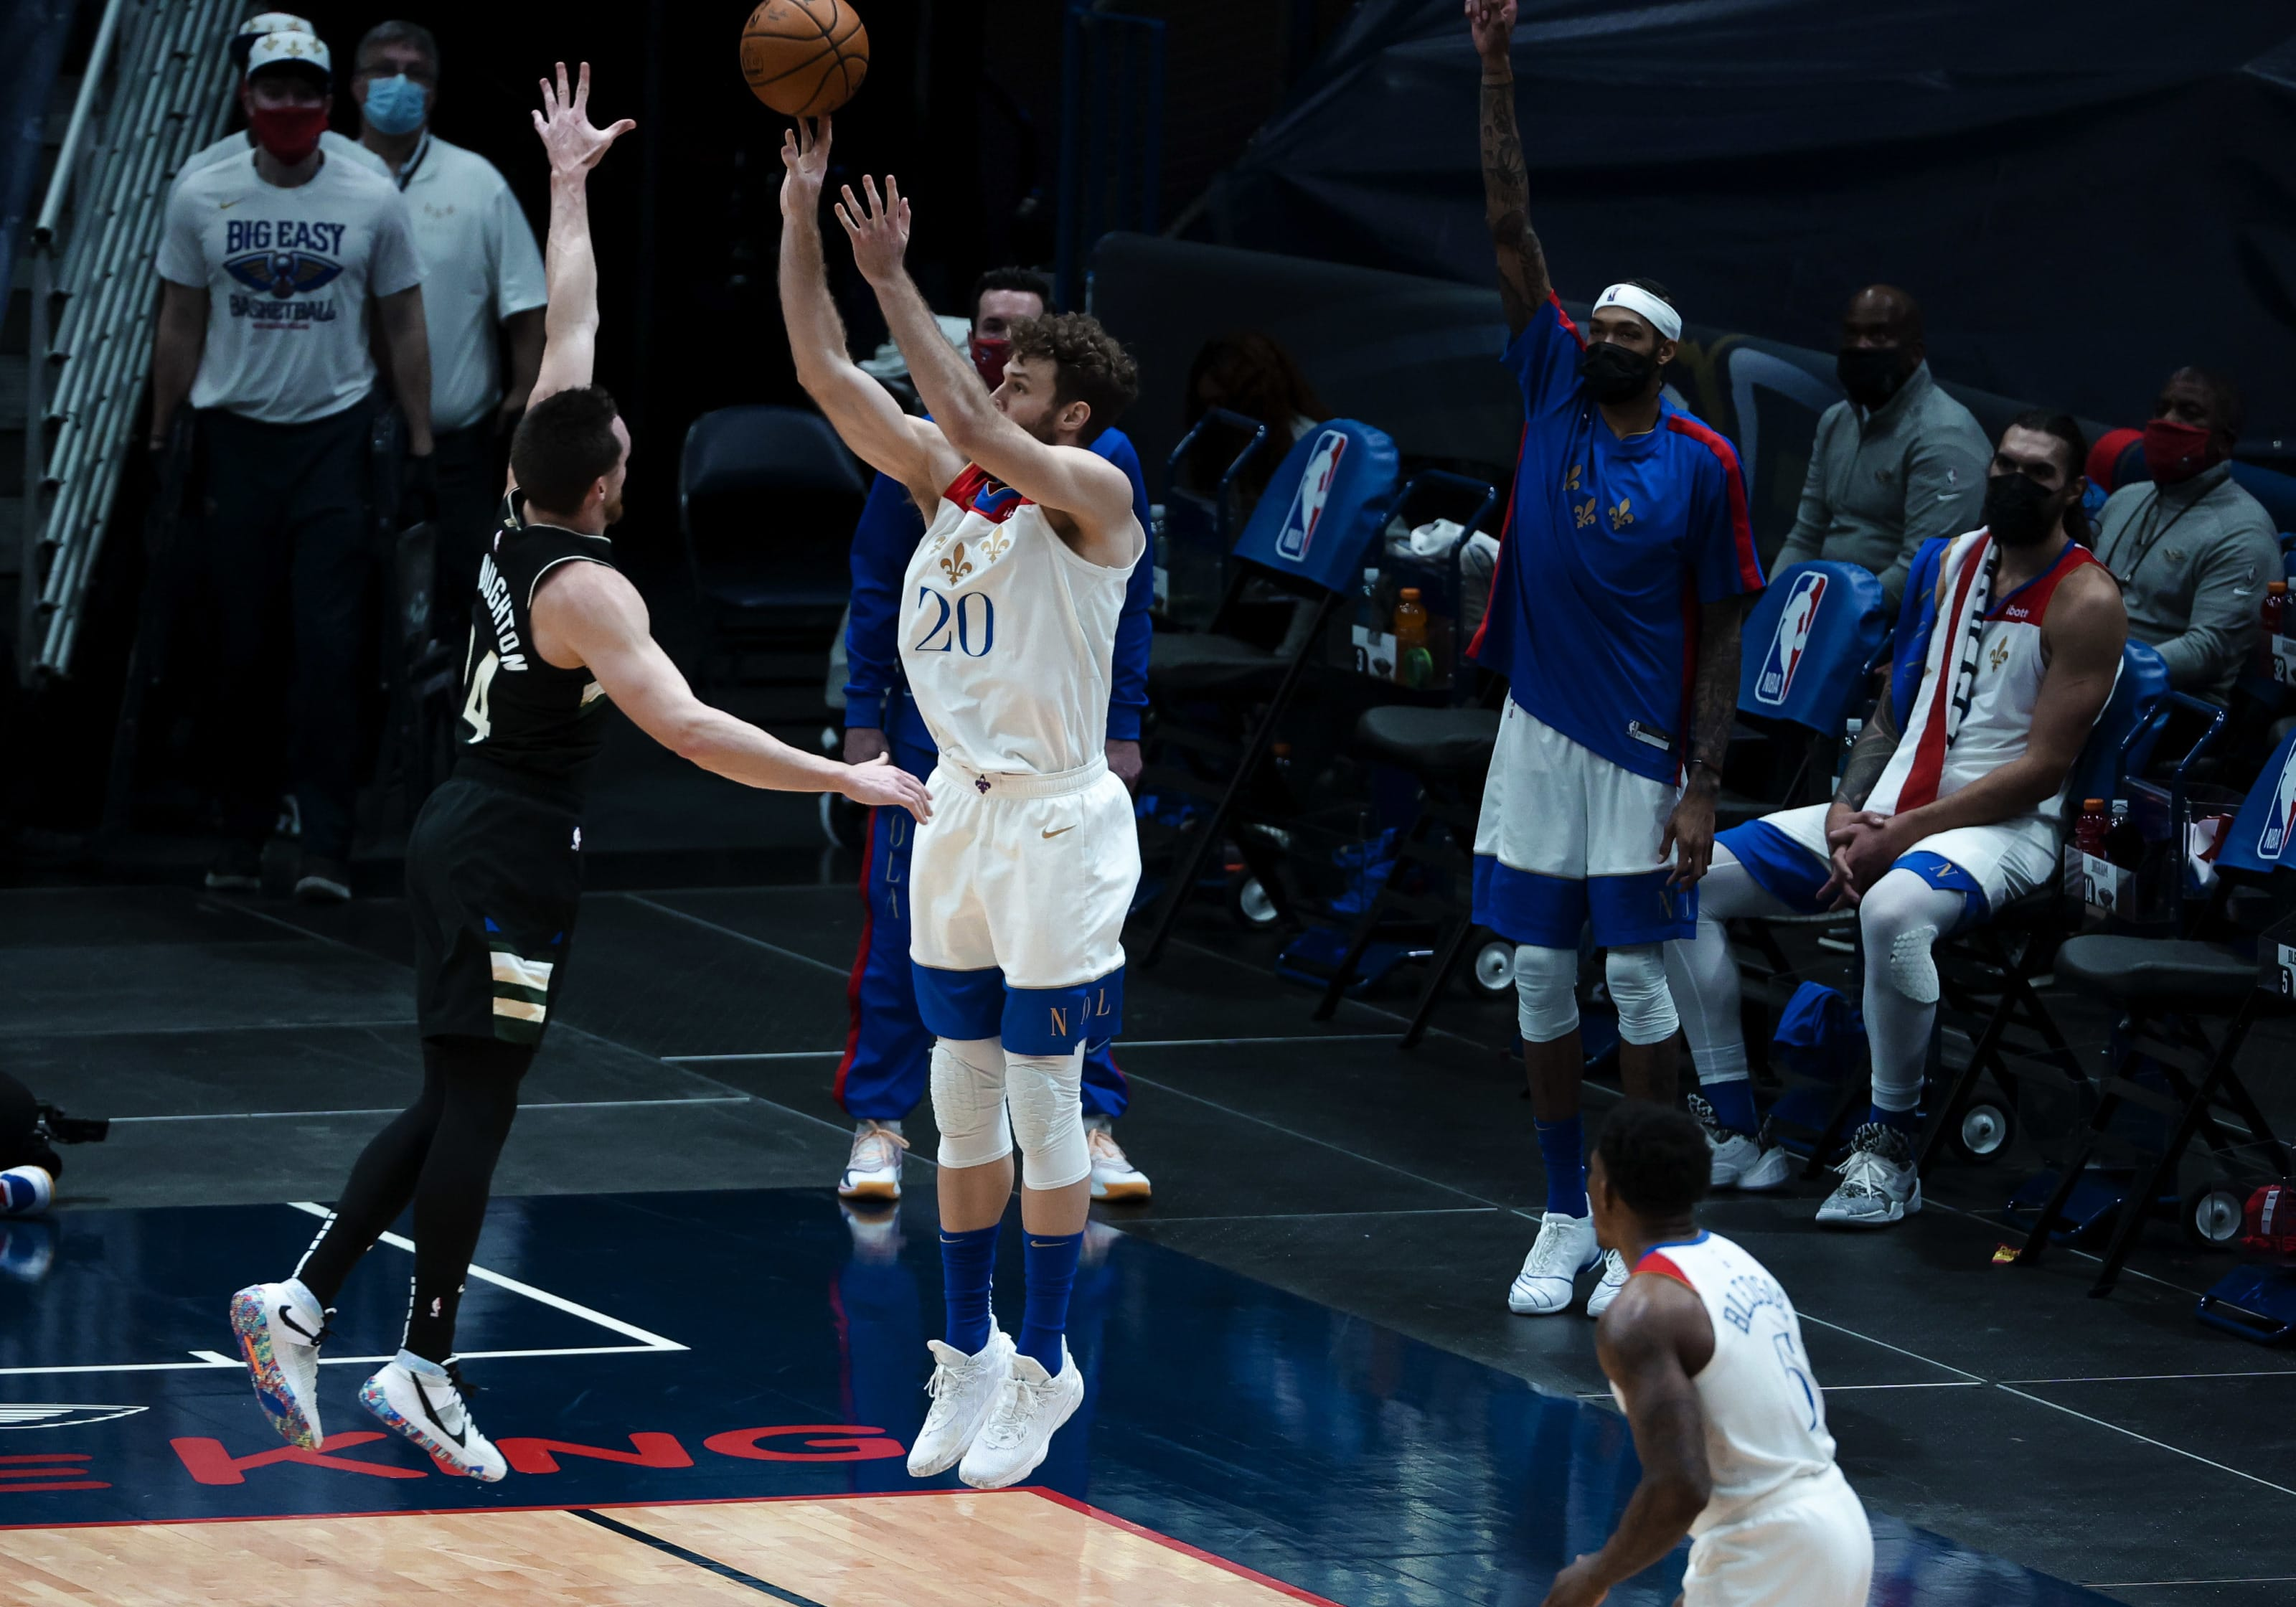 Milwaukee Bucks: Pat Connaughton, New Orleans Pelicans: Nicolo Melli